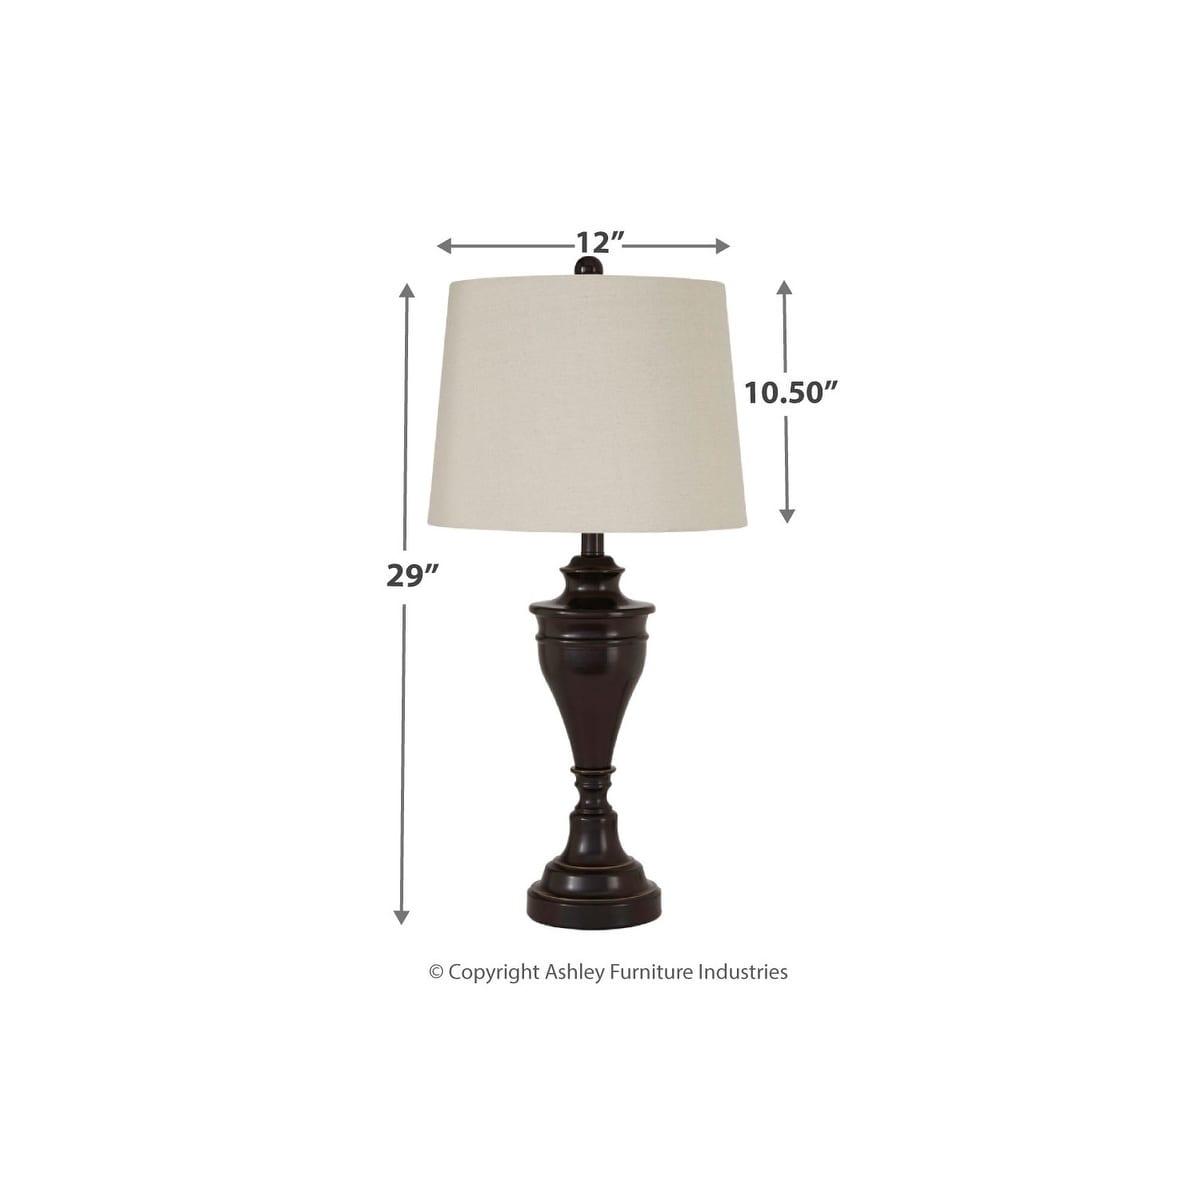 Darlita Bronze Finish 30 Inch Metal Table Lamps Set Of 2 On Sale Overstock 14206634